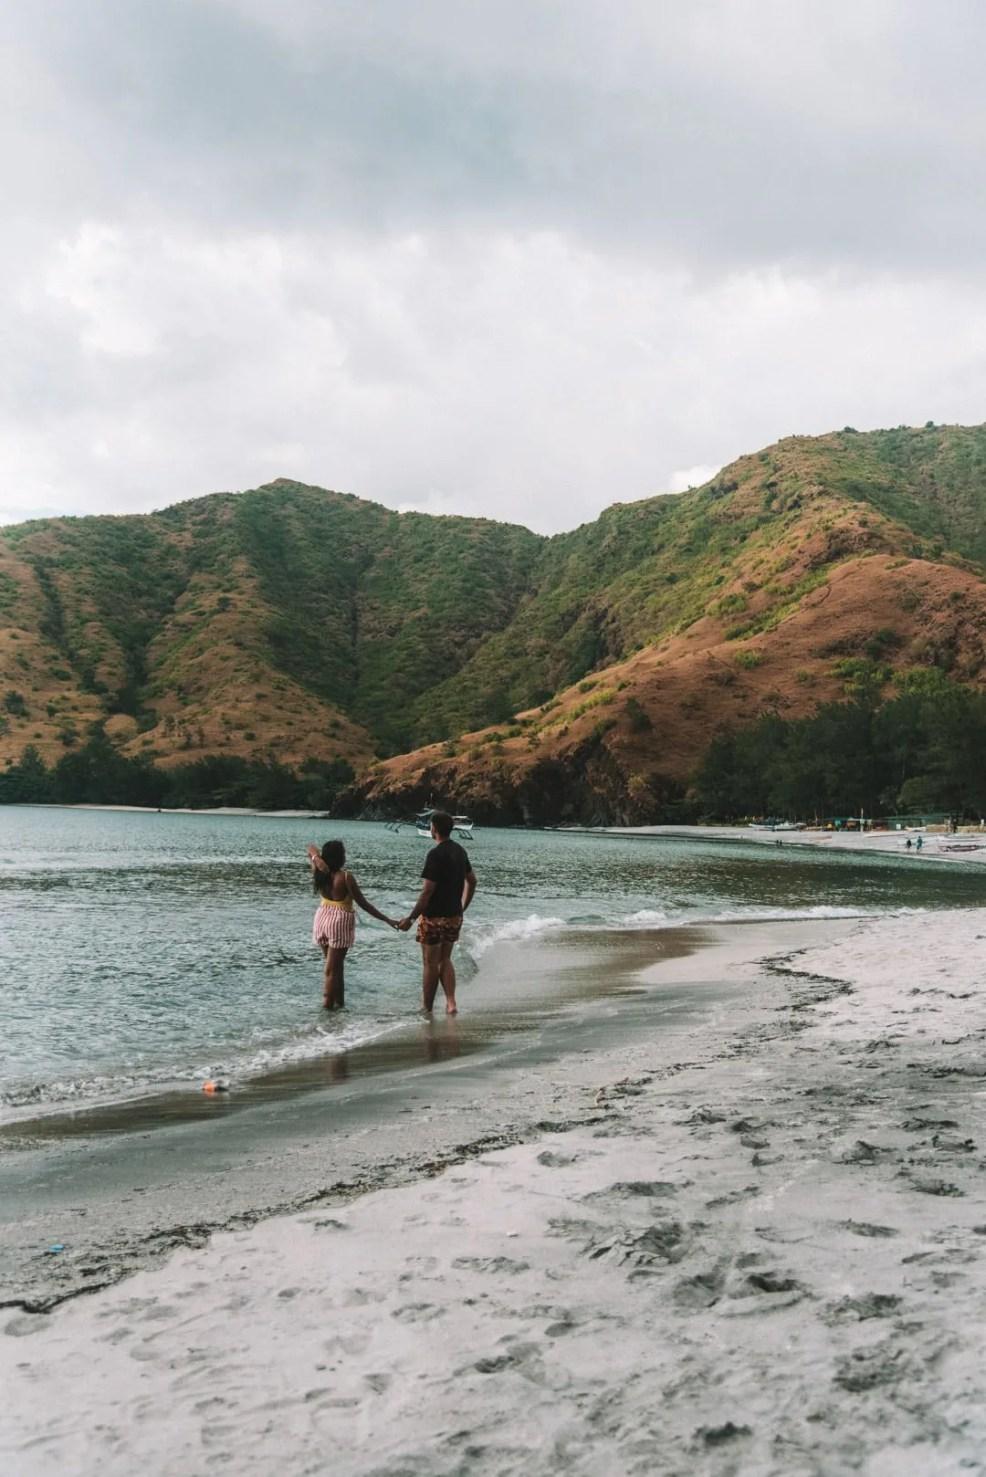 Beaches in Zambales, Capones Island, Island hopping in Zambales, Zambales travel guide, Anawangin Cove